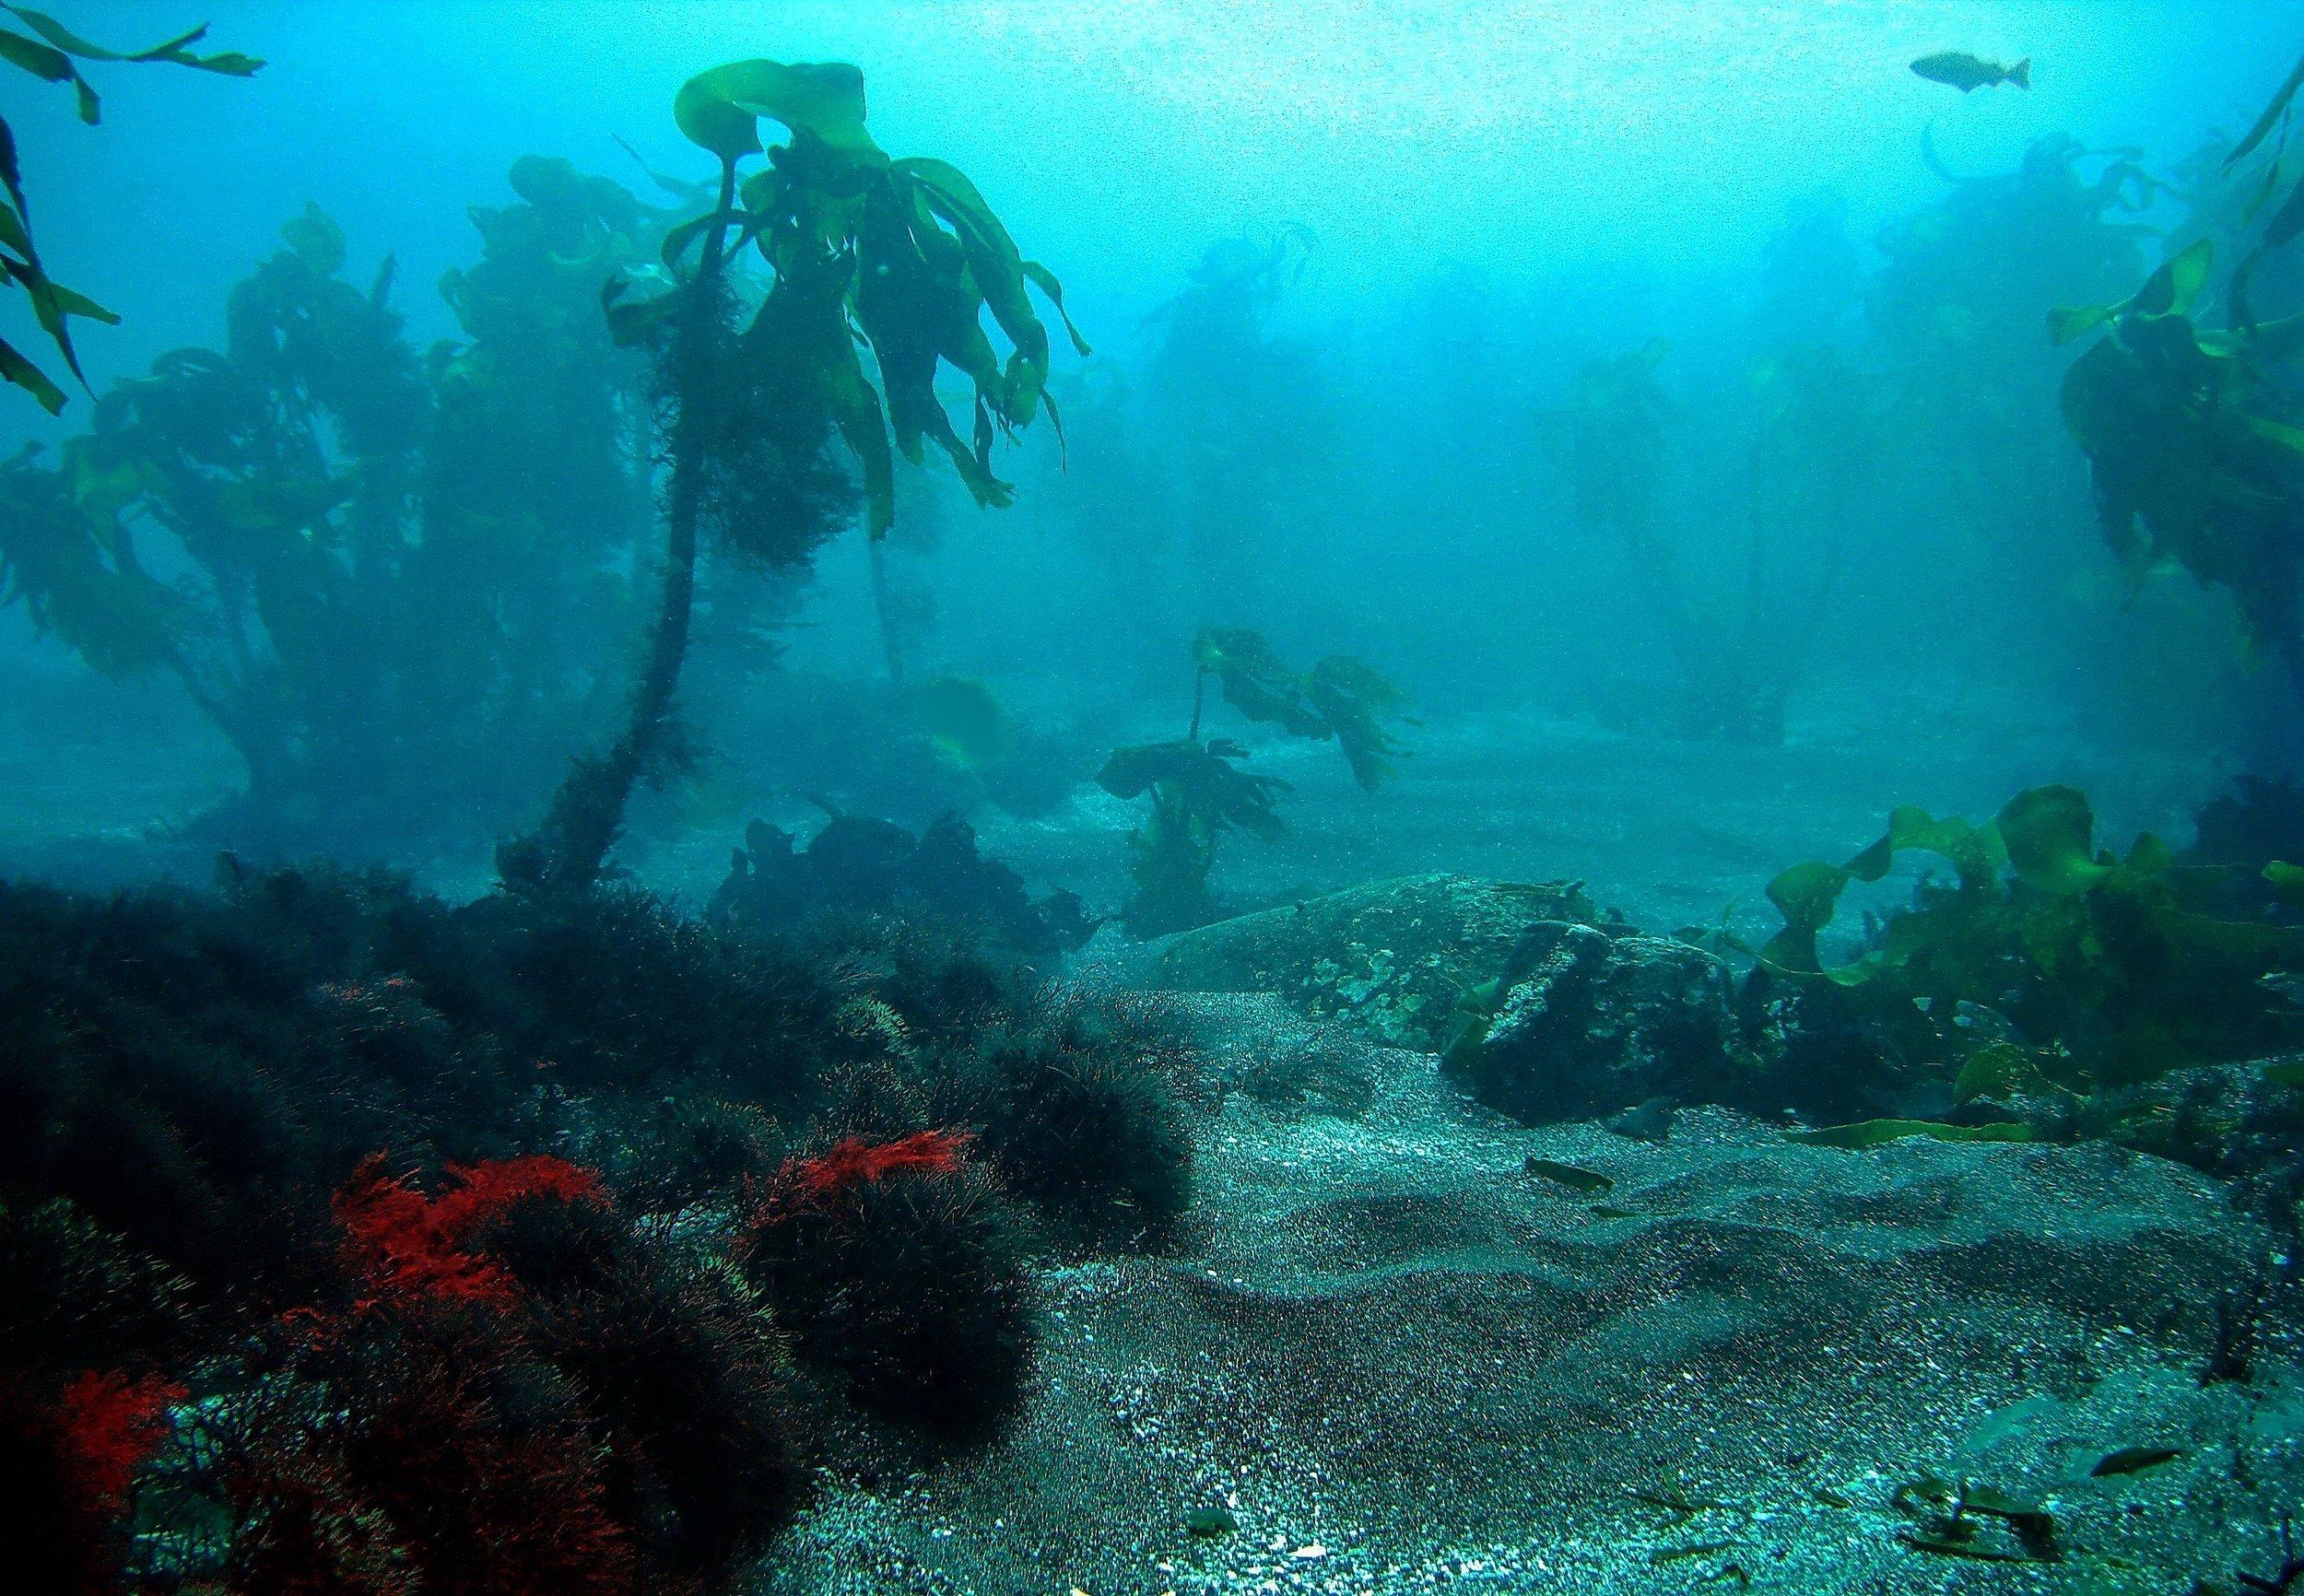 Surreal scenery: Ten meters below the water line